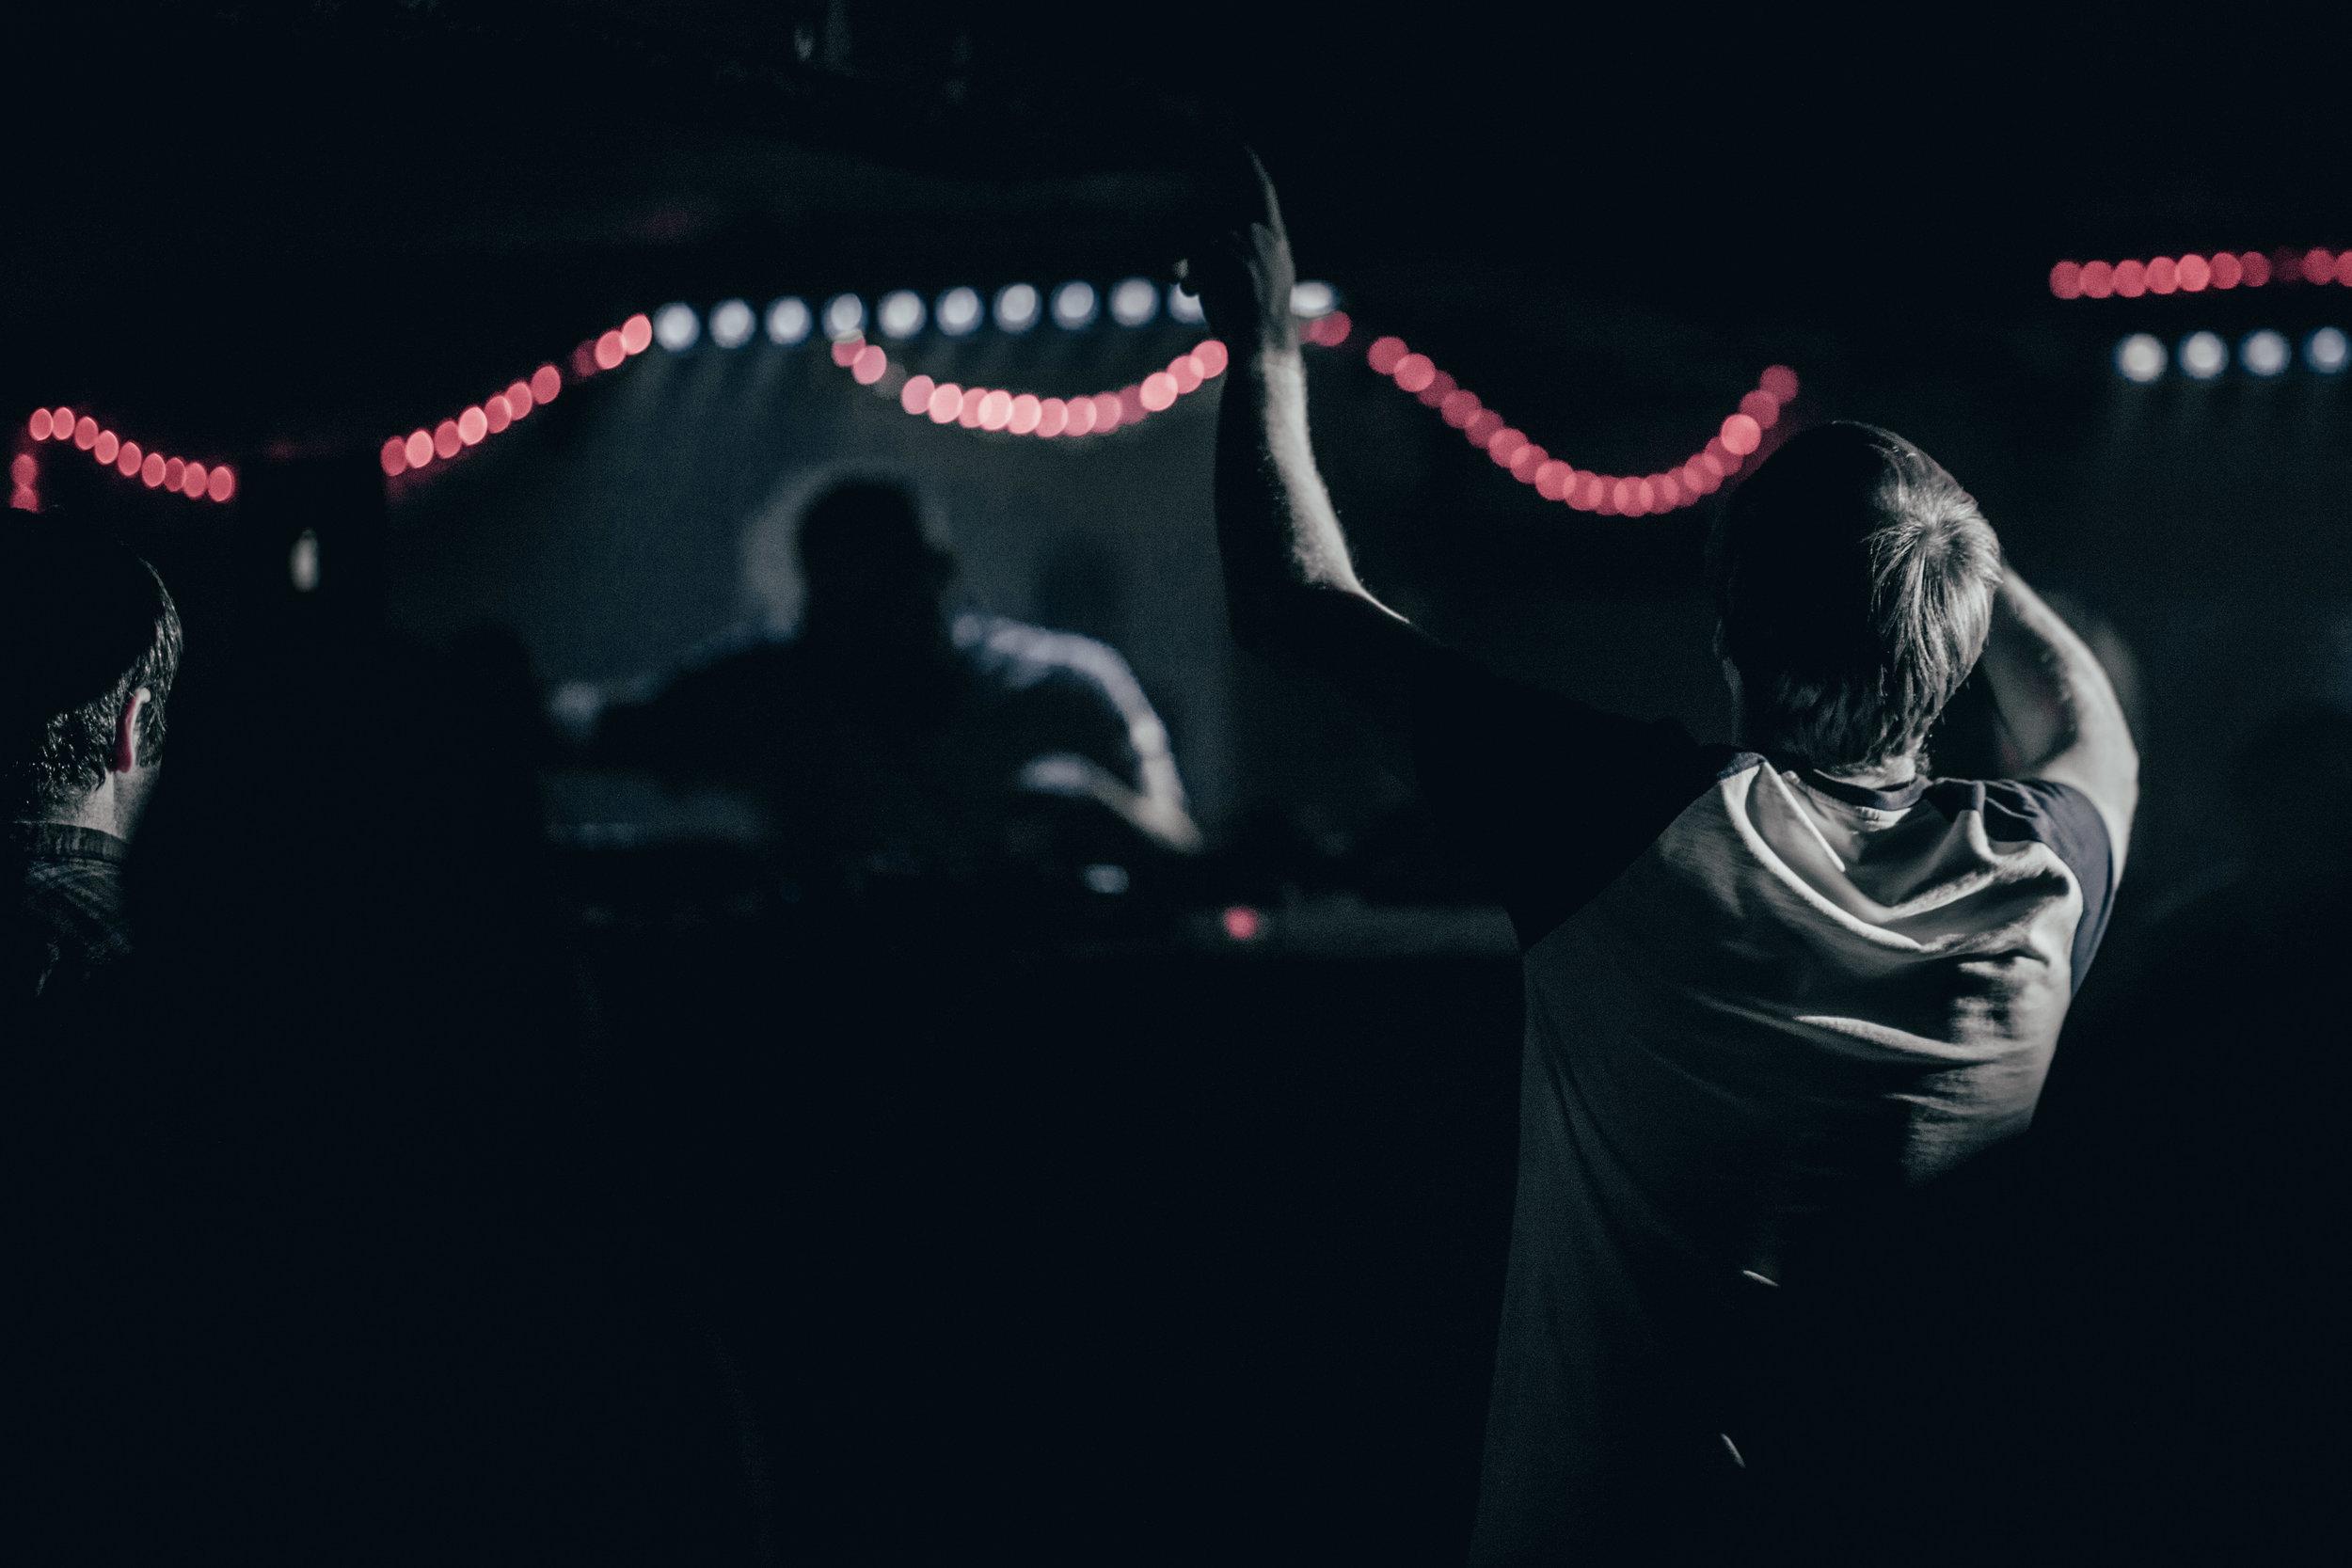 Nightlife -